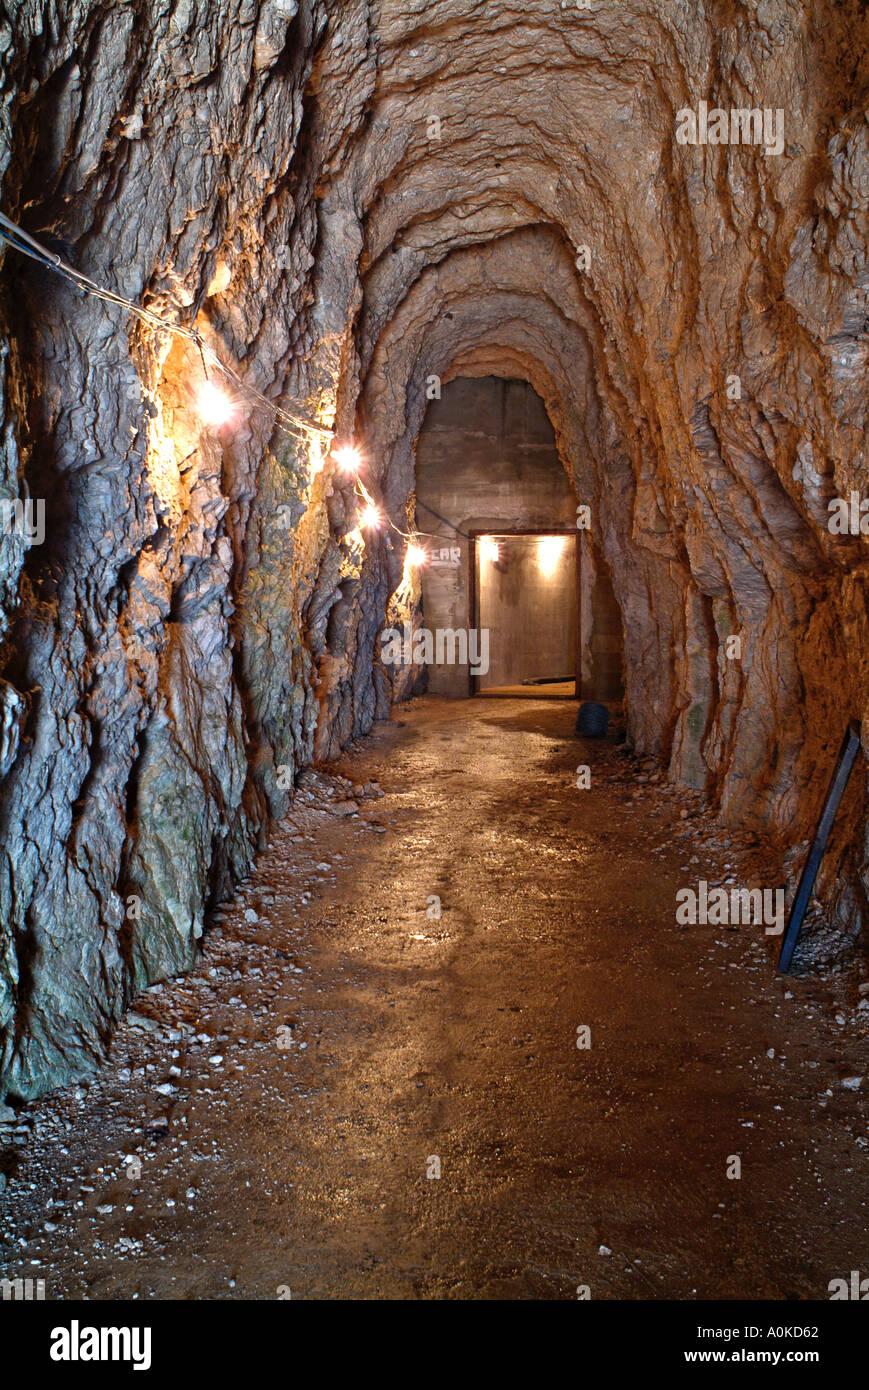 pictures secret tunnel explored - photo #48